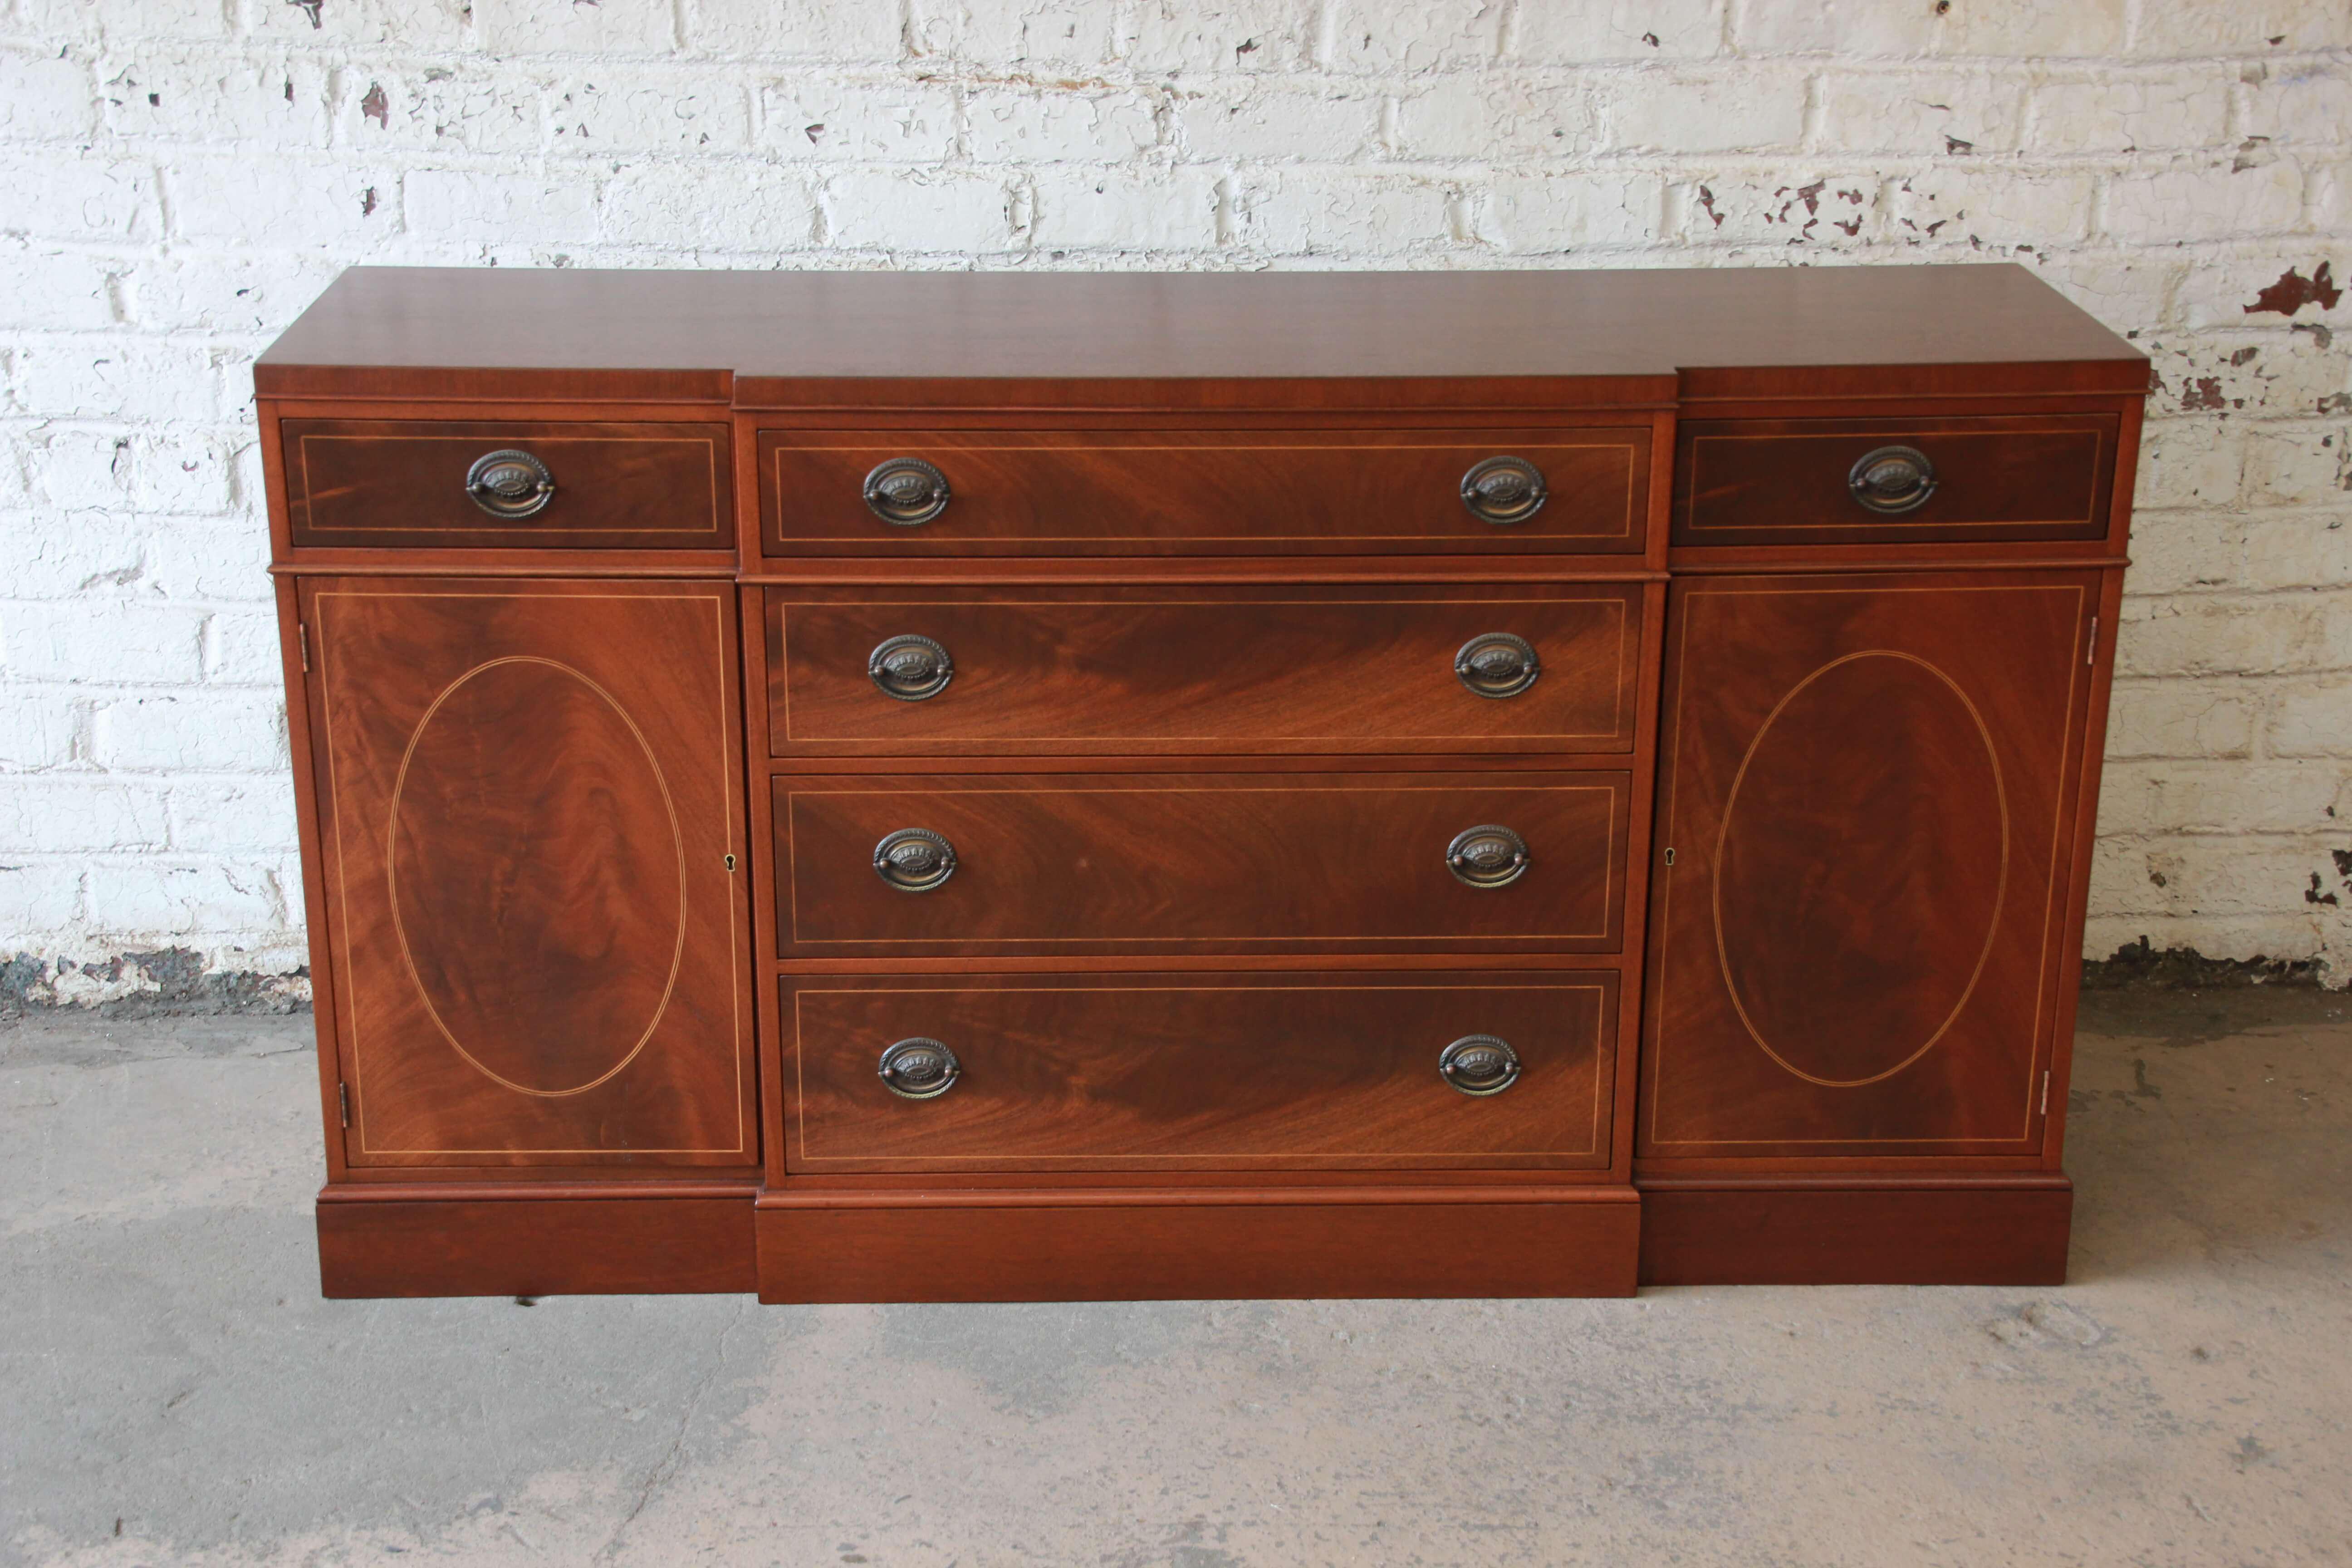 Baker Furniture Inlaid Mahogany Sideboard Buffet Chairish